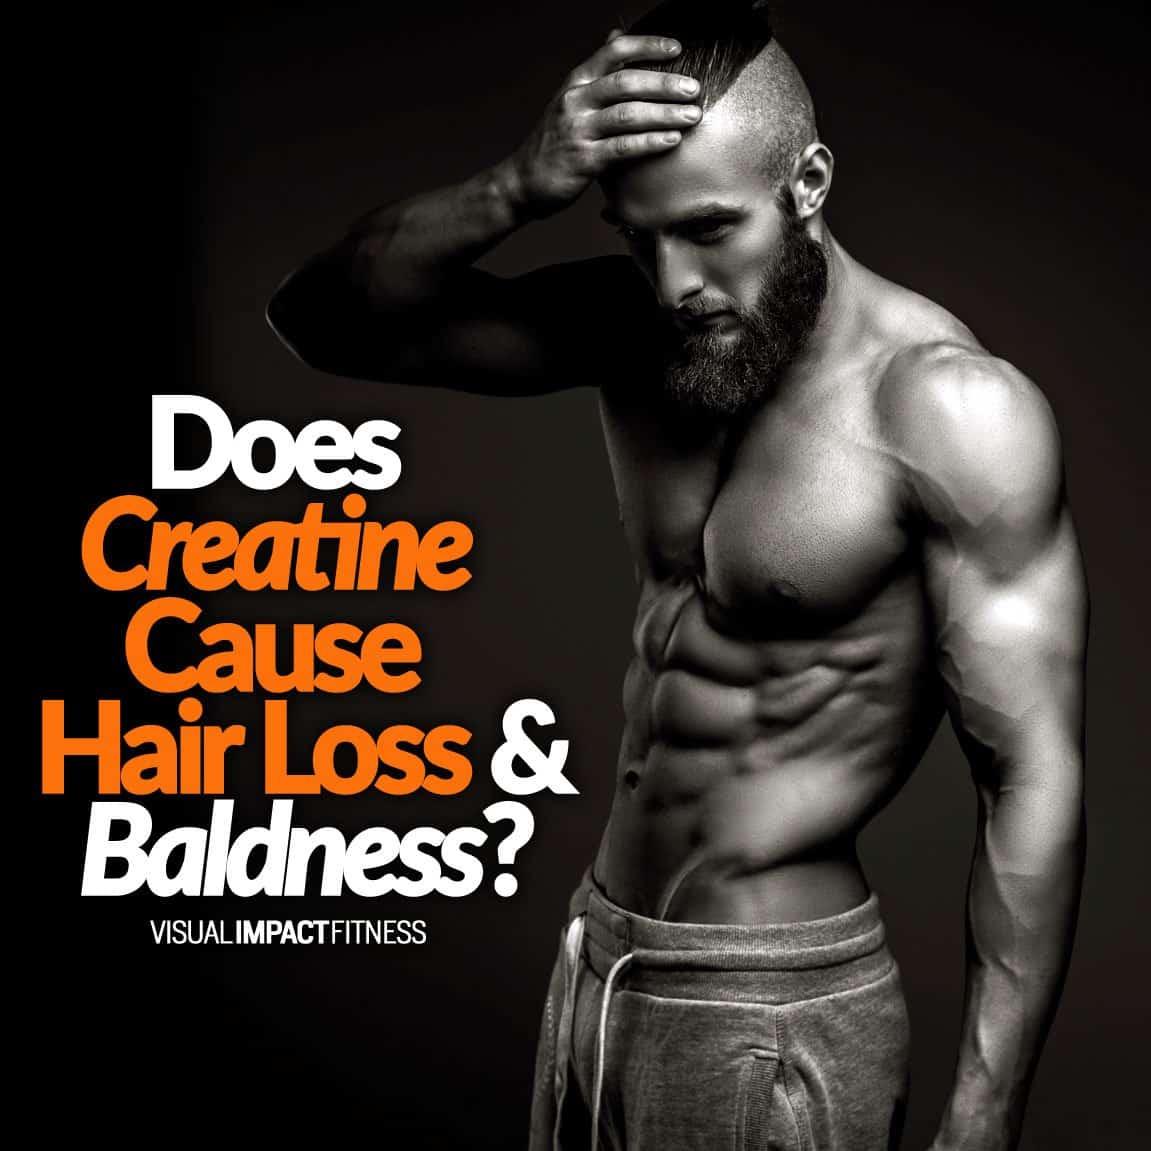 Does Creatine Cause Hair Loss & Baldness